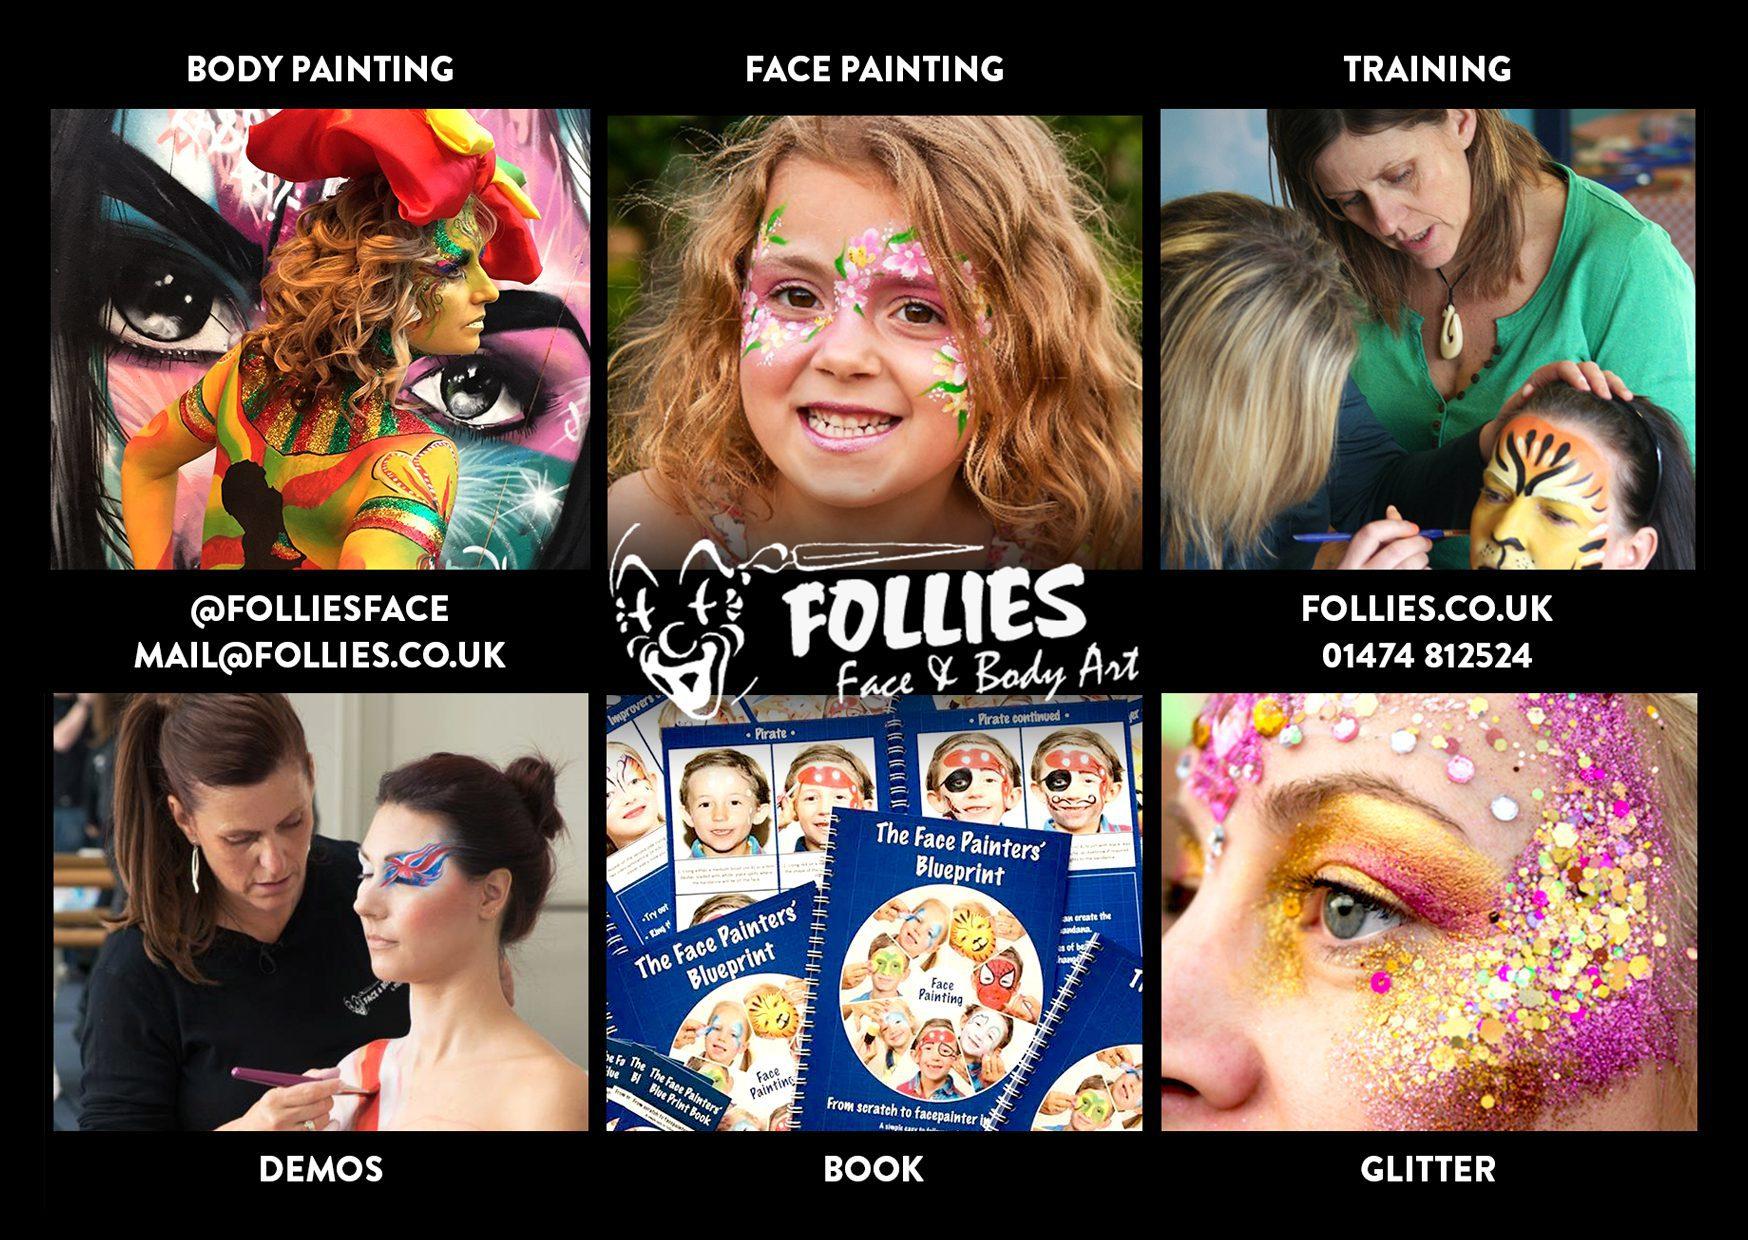 Follies Face And Body Art